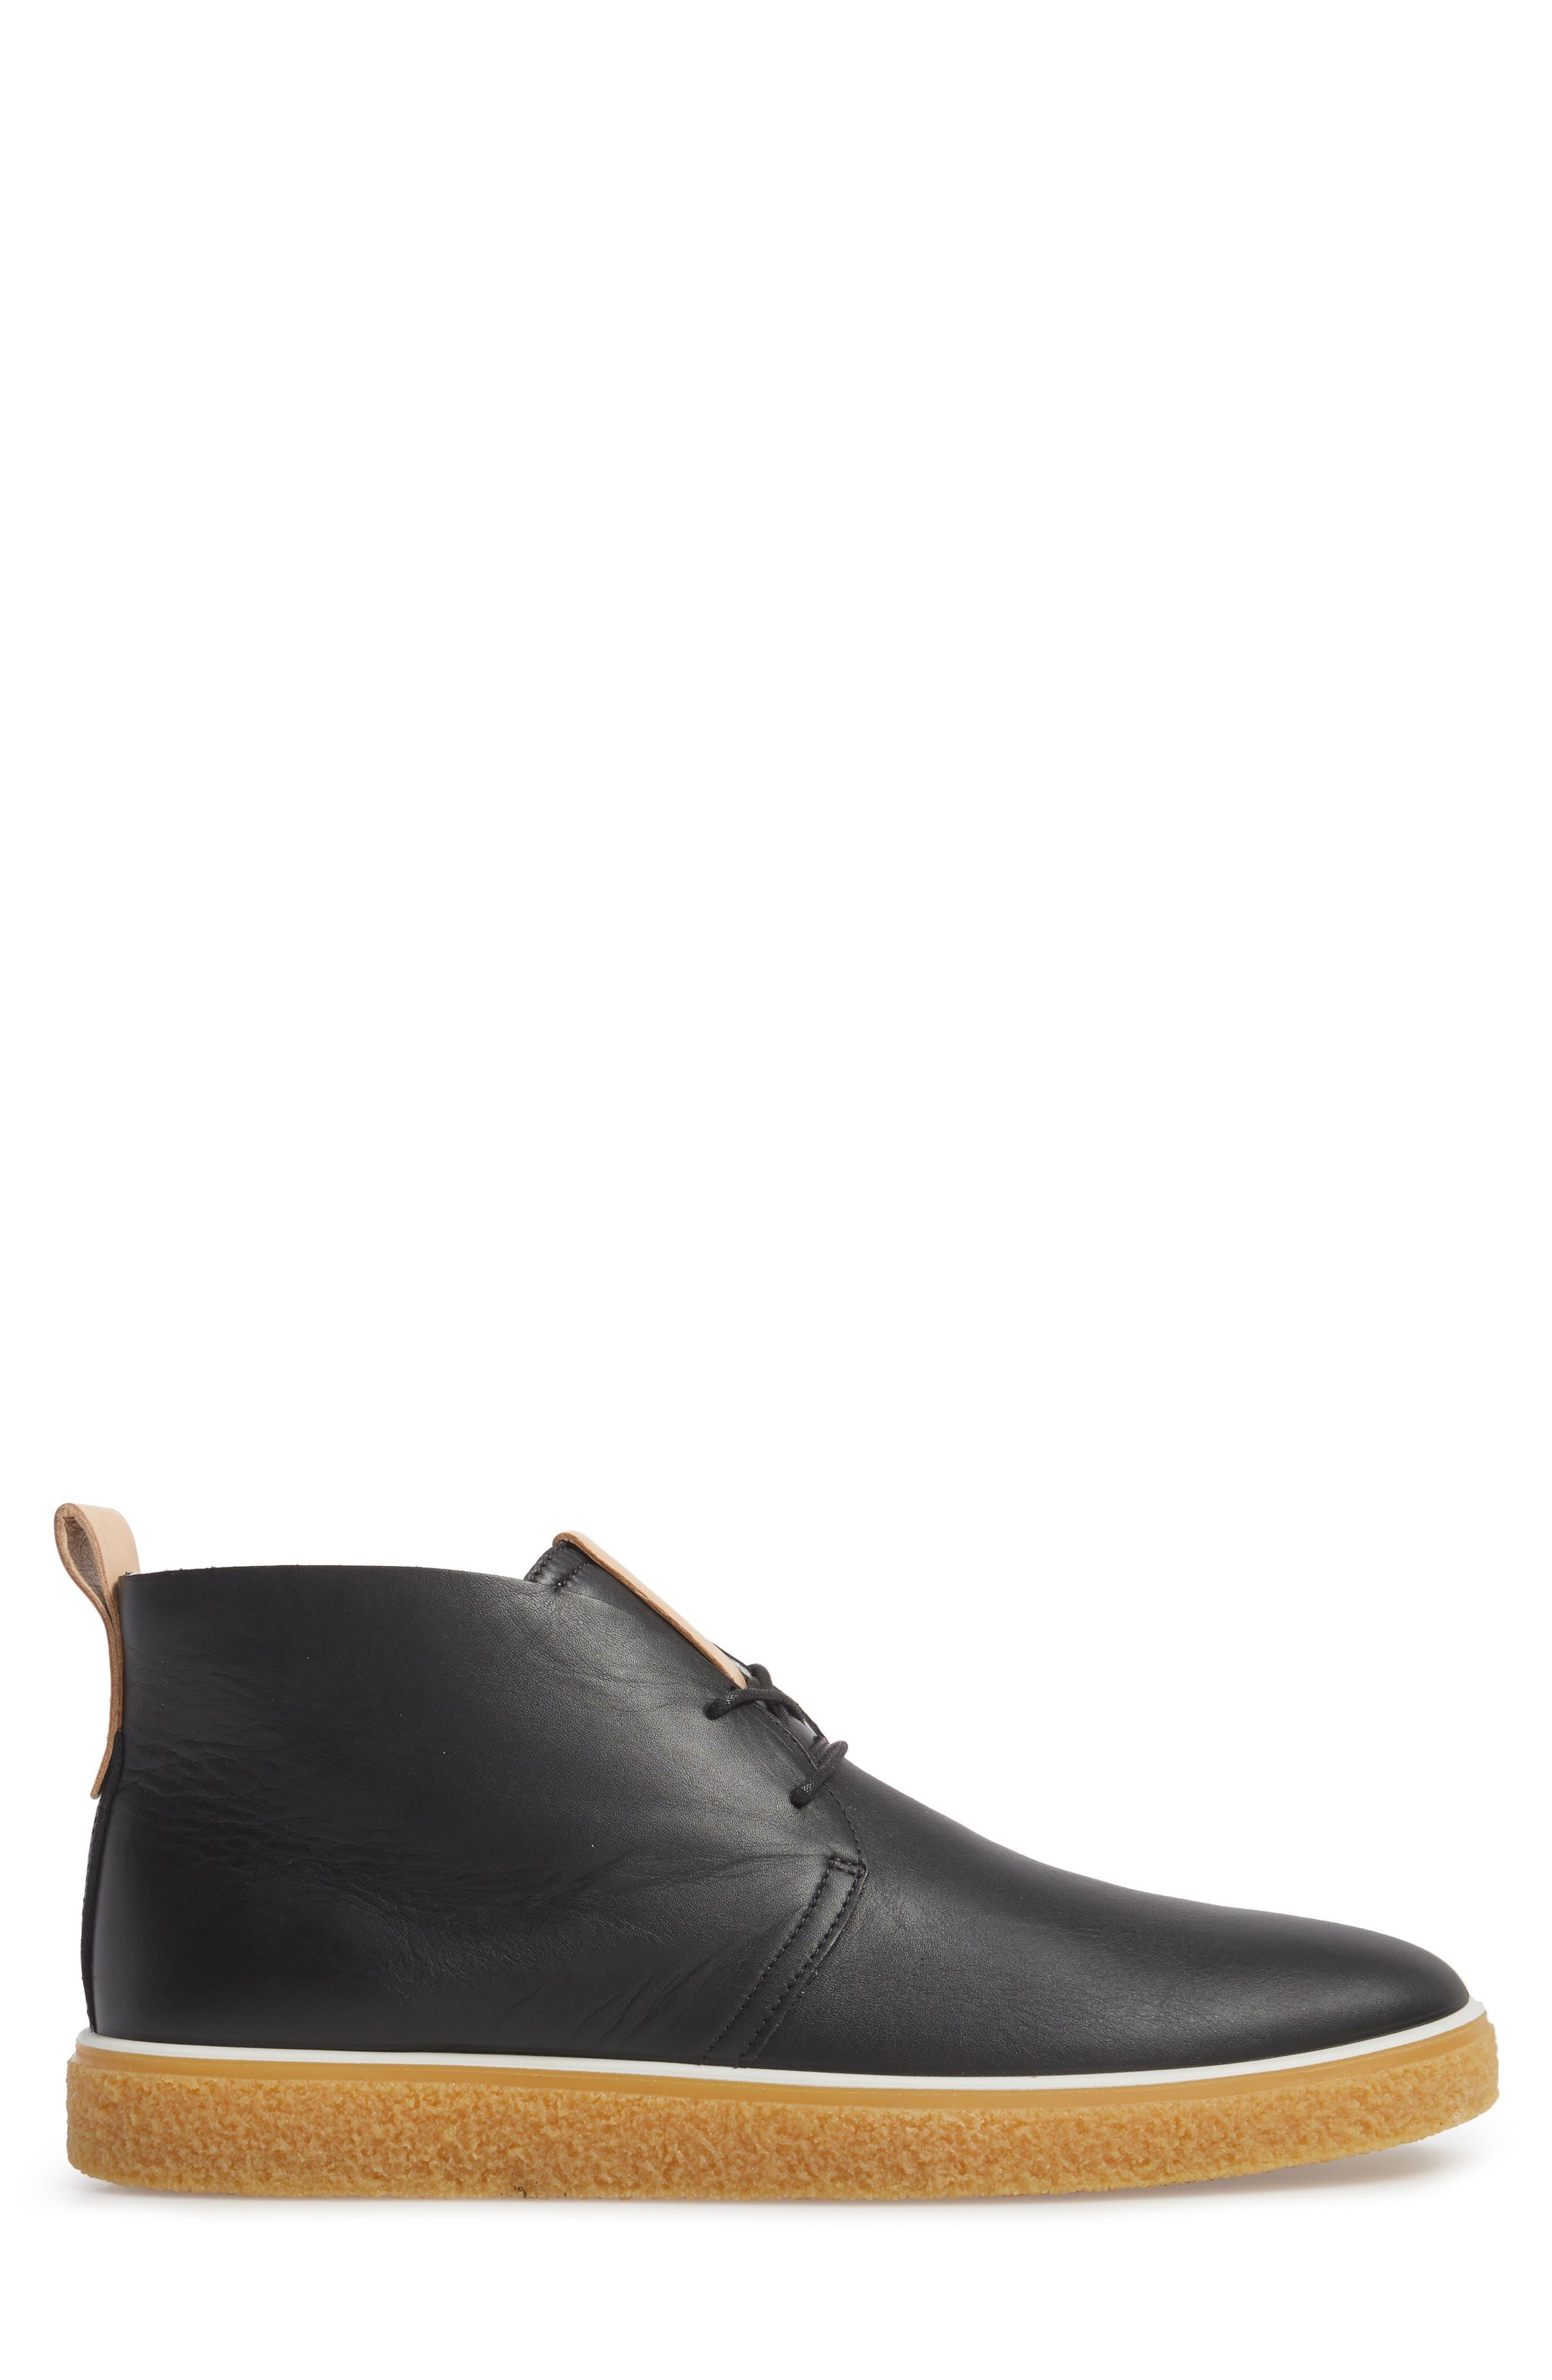 Crepetray Chukka Boot,                             Alternate thumbnail 3, color,                             Black Leather